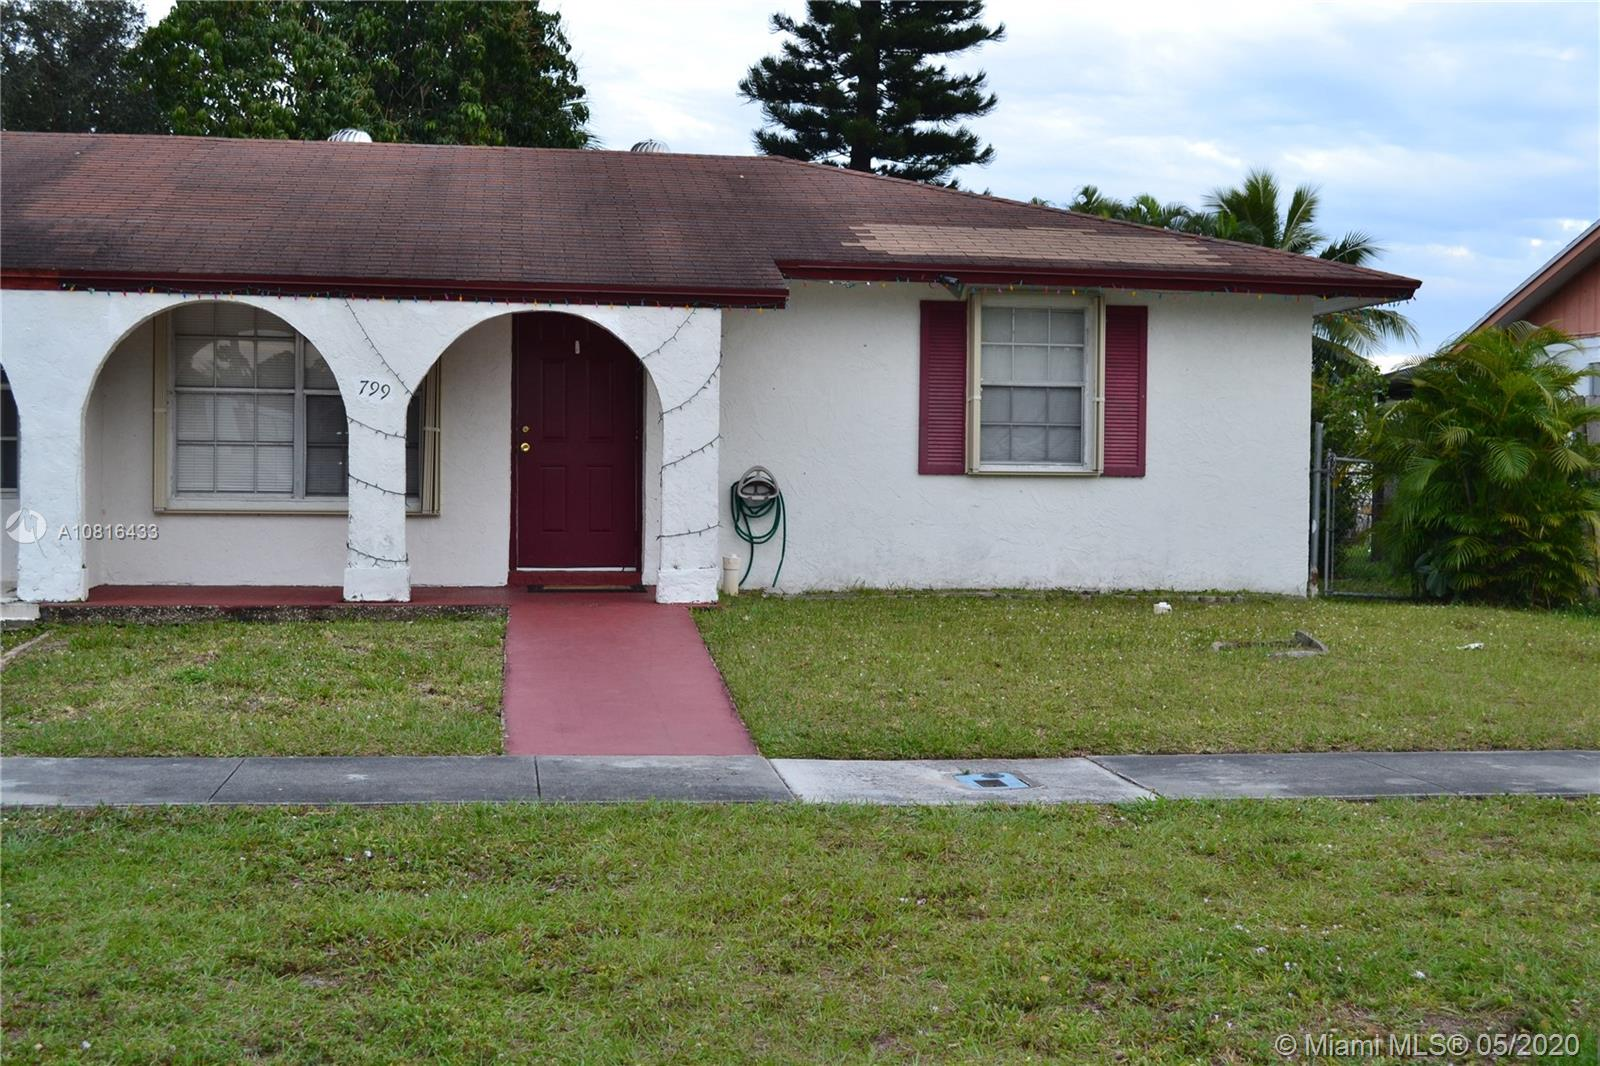 799 Ilene Rd E 0, West Palm Beach, FL 33415